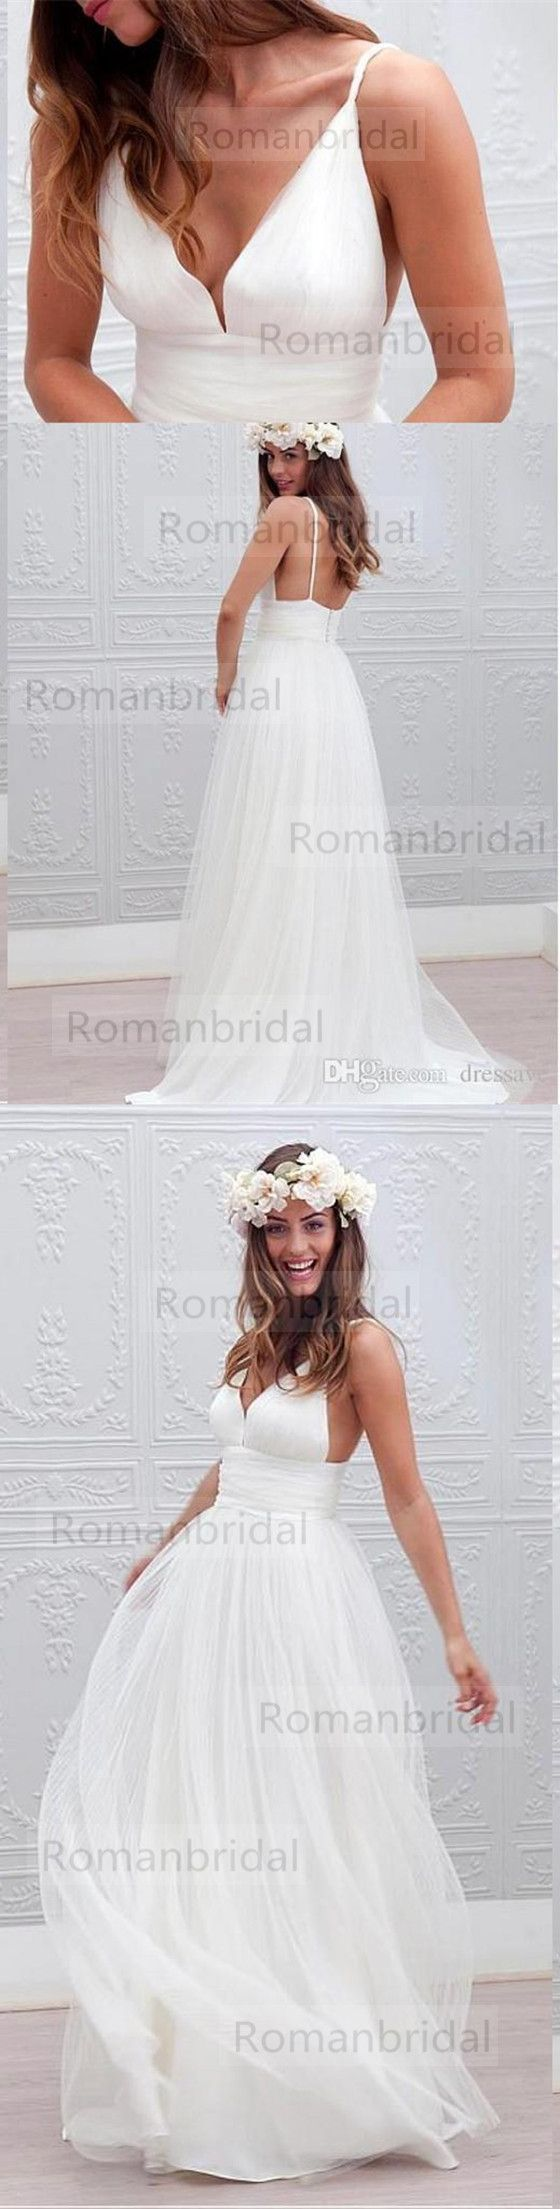 2018 Newest simple Floor-length white wedding dresses, Spaghetti Strap sleeveless elegant Deep V-neck Sexy Wedding Dress, WD0308